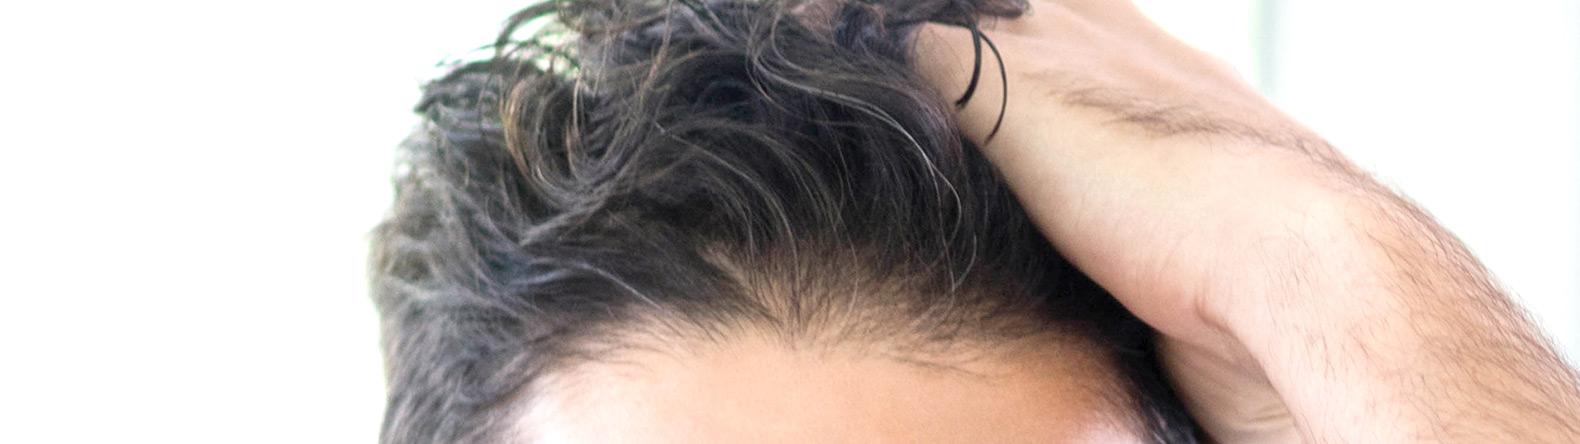 Mandraccia-Hair-Transplant-Fort-Myers-Naples